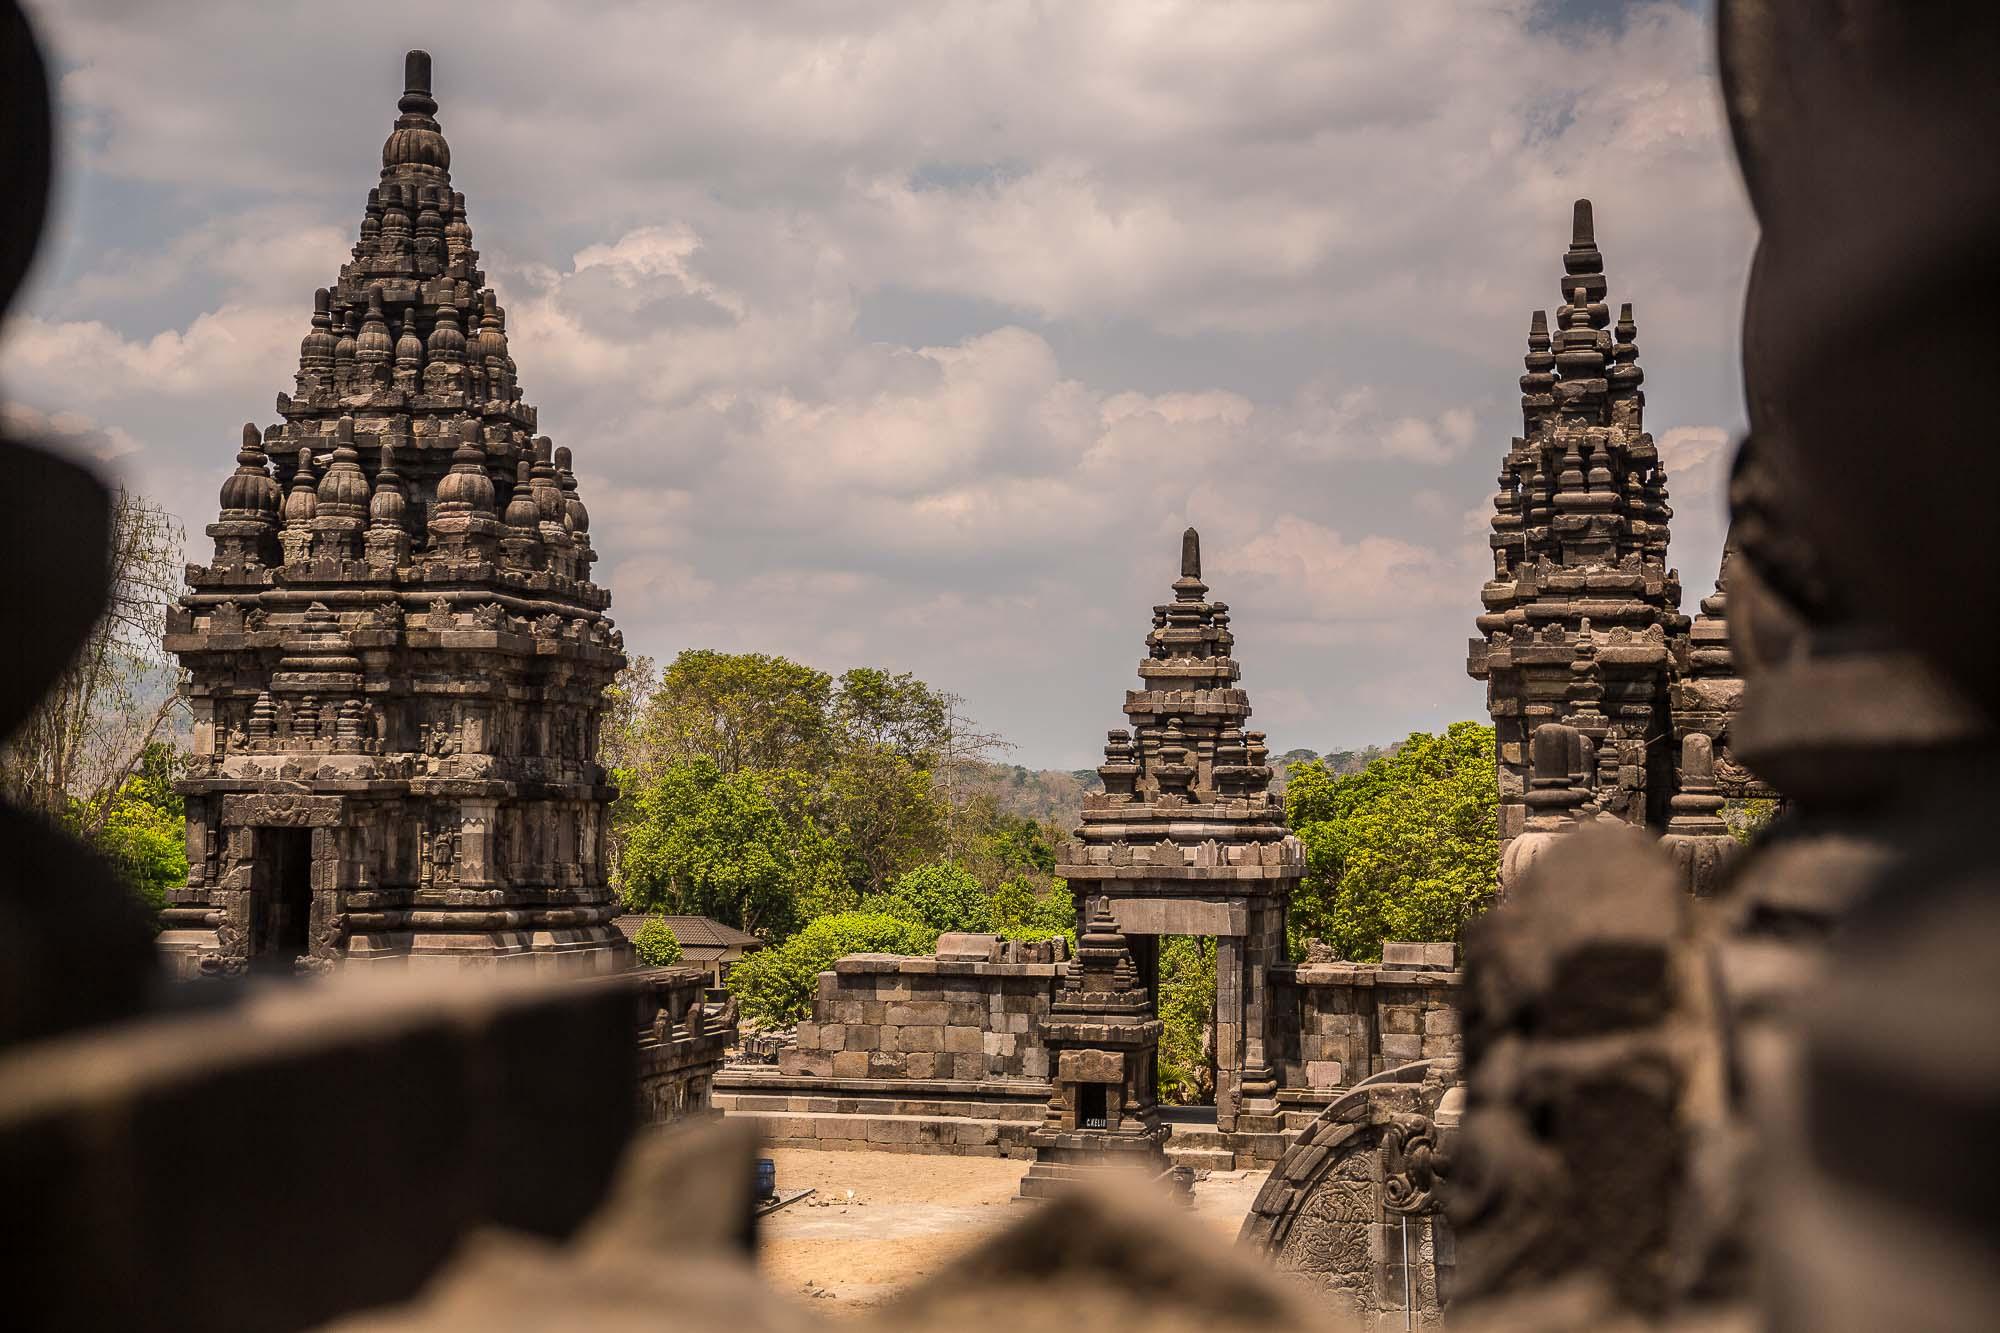 INDONESIA_2015_02 BOROBODUR-PRAMBANAN-YOGYA_JusMedic_235